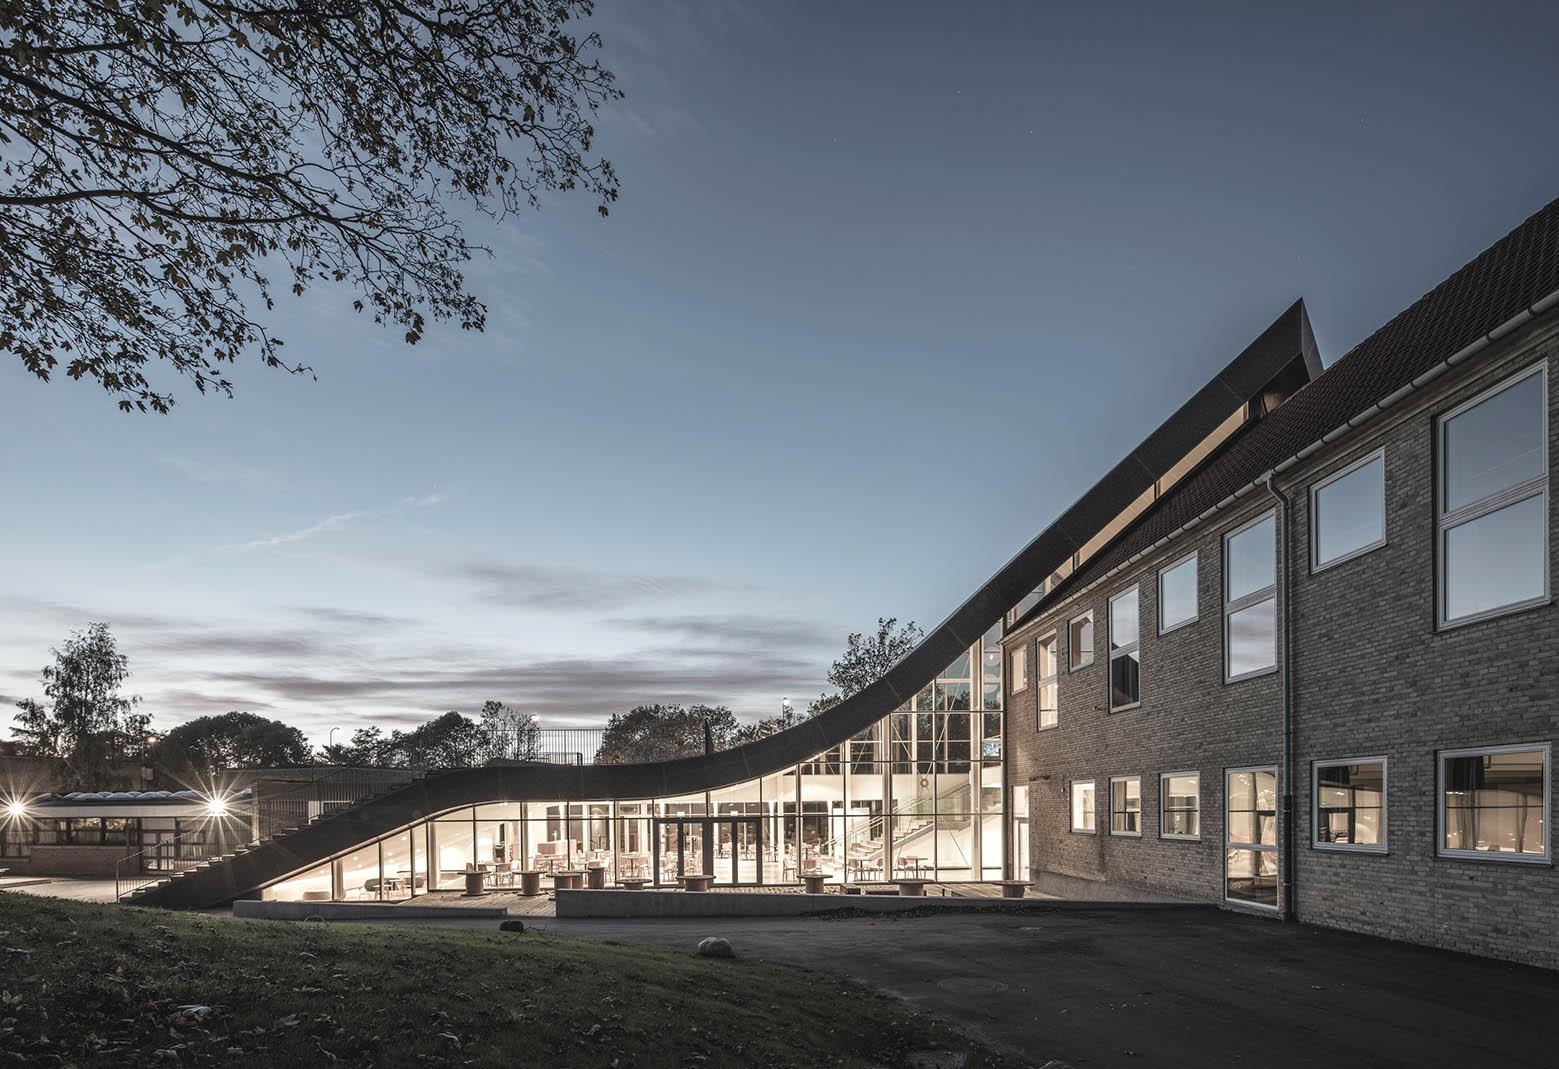 Centro Cultural Mariehøj / Sophus Søbye Arkitekter + WE Architecture